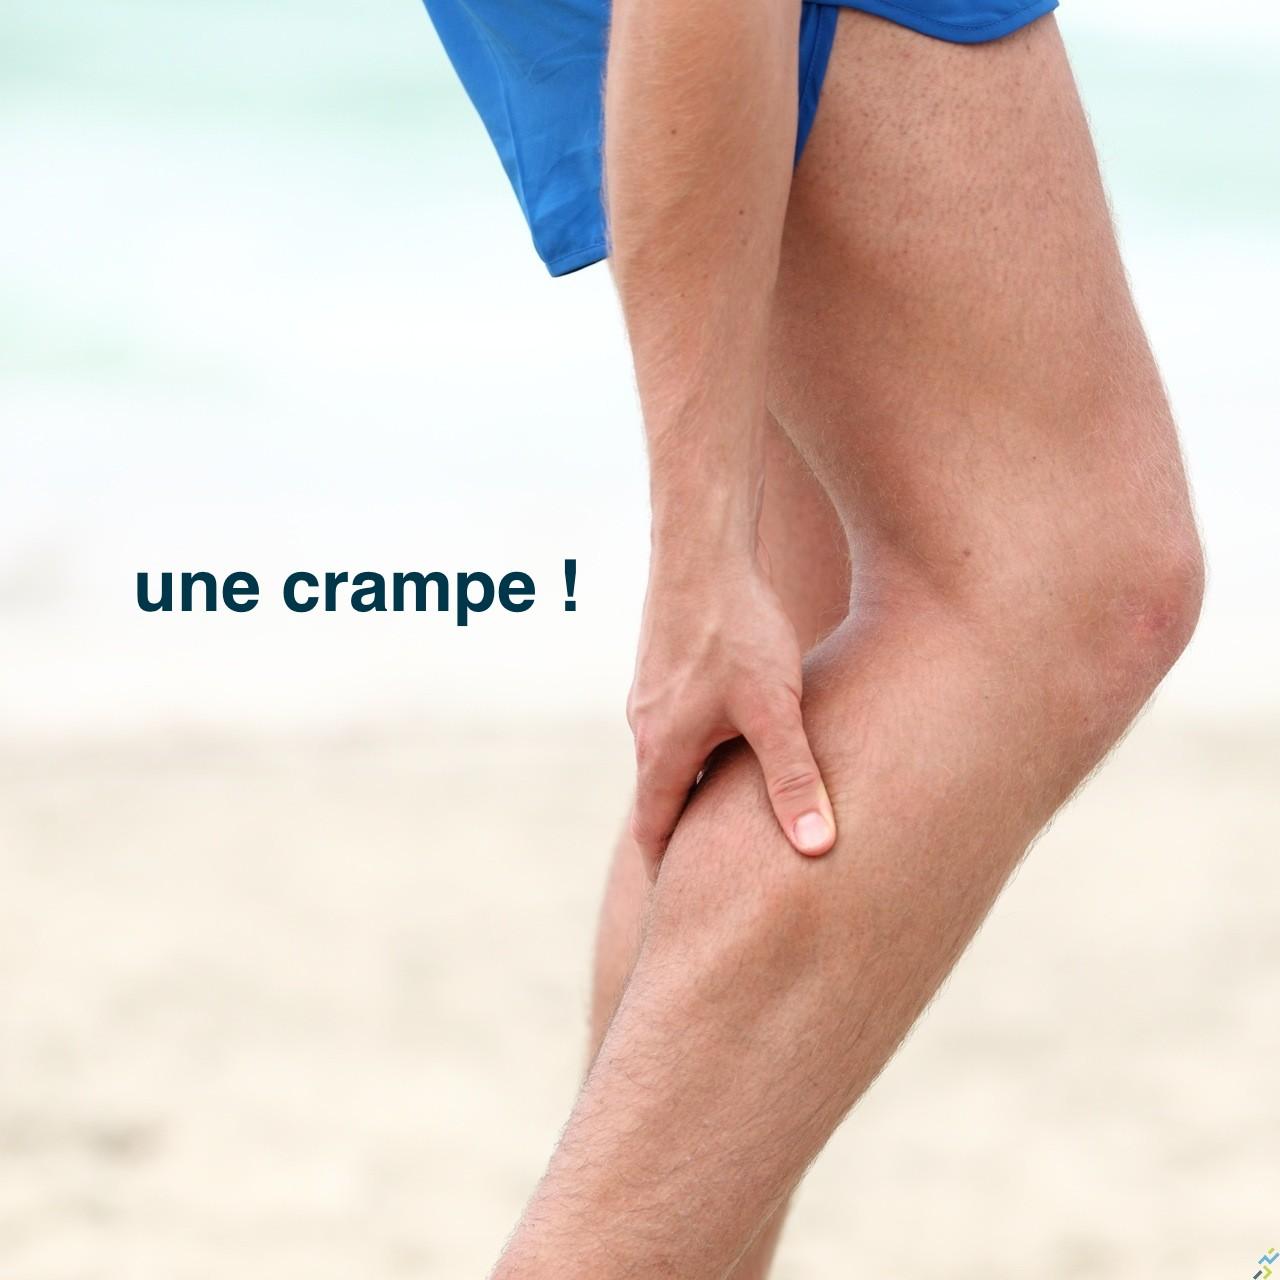 Crampe 1